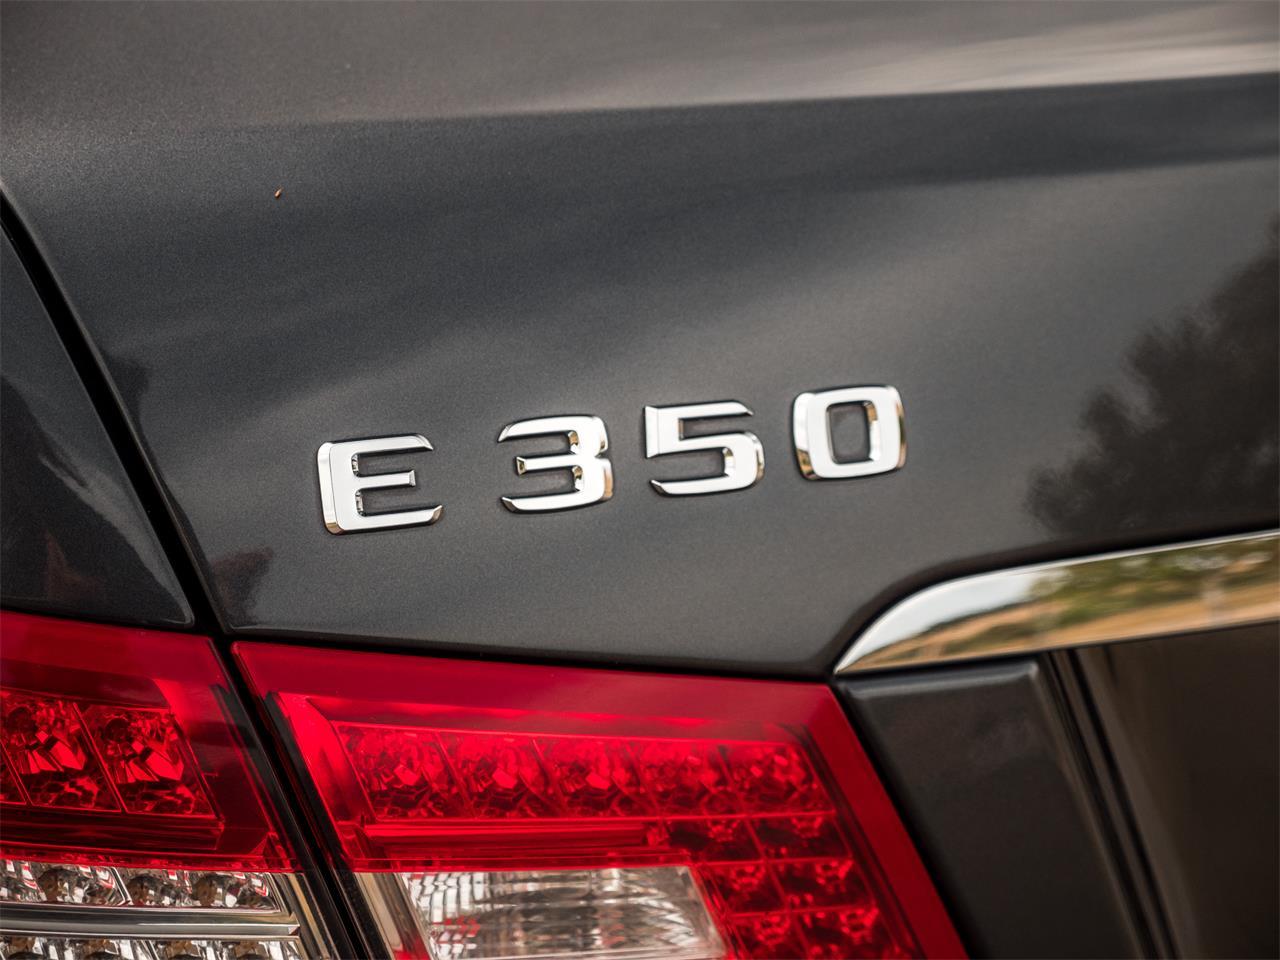 2012 Mercedes-Benz E-Class (CC-1267917) for sale in Kelowna, British Columbia